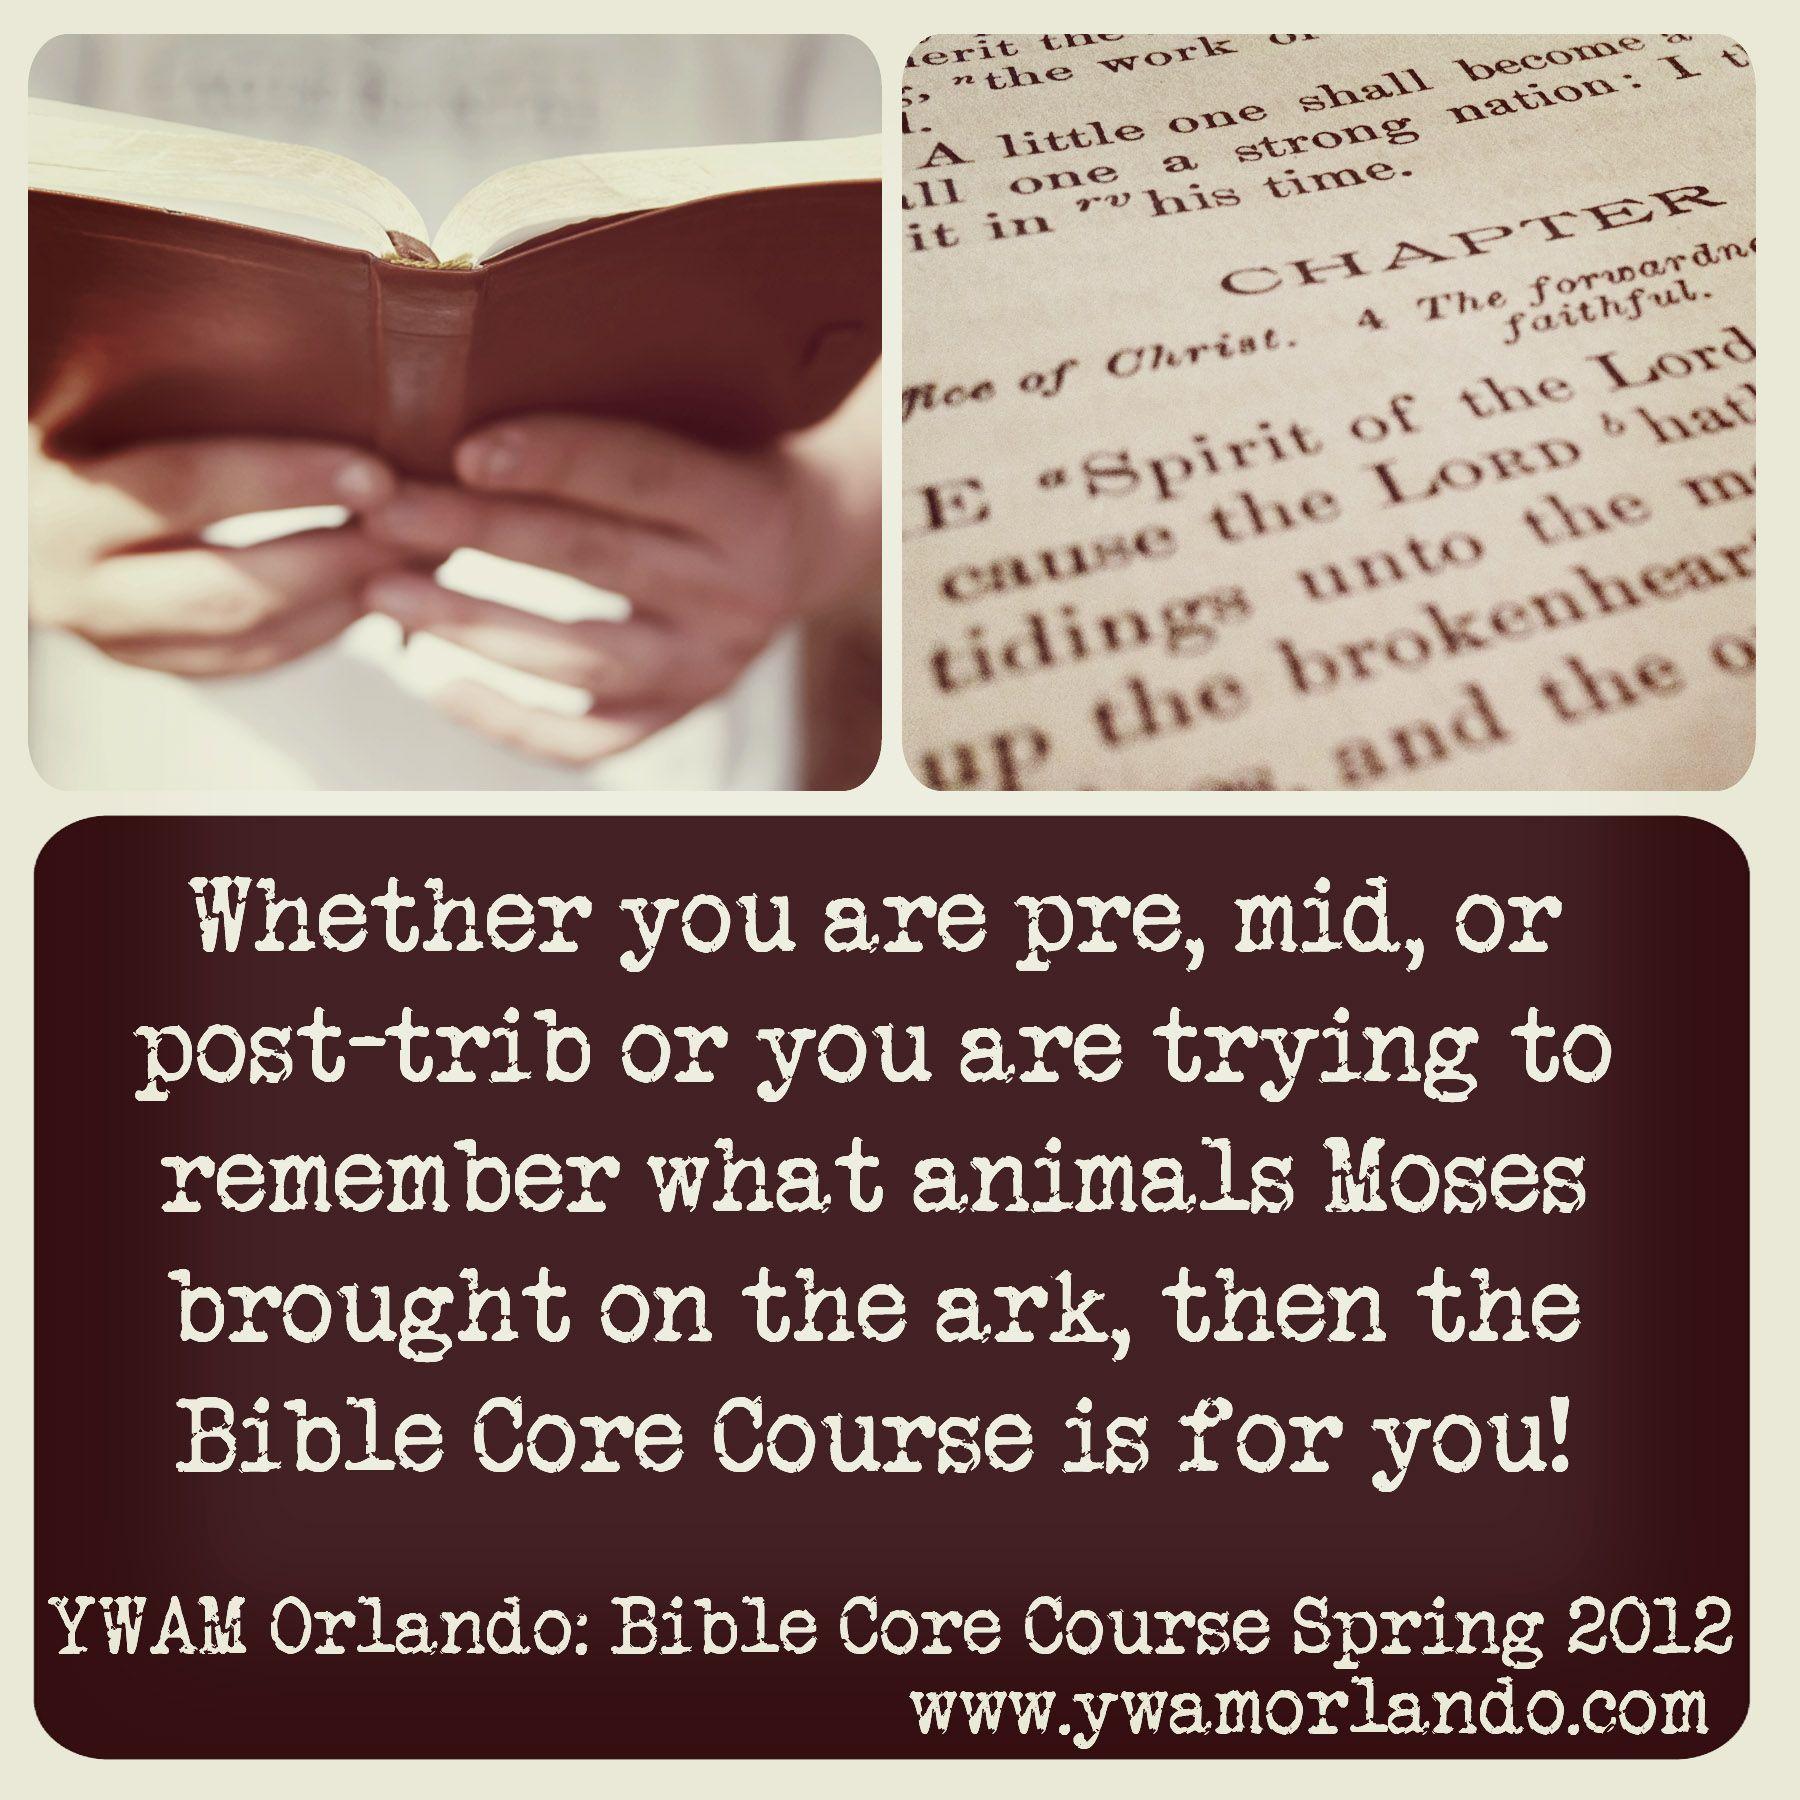 Bible Core Course @ YWAM Orlando: http://www.ywamorlando.com/traning_school_bible_core_course.aspx. Youth With A Mission | YWAM Orlando | www.ywamorlando.com